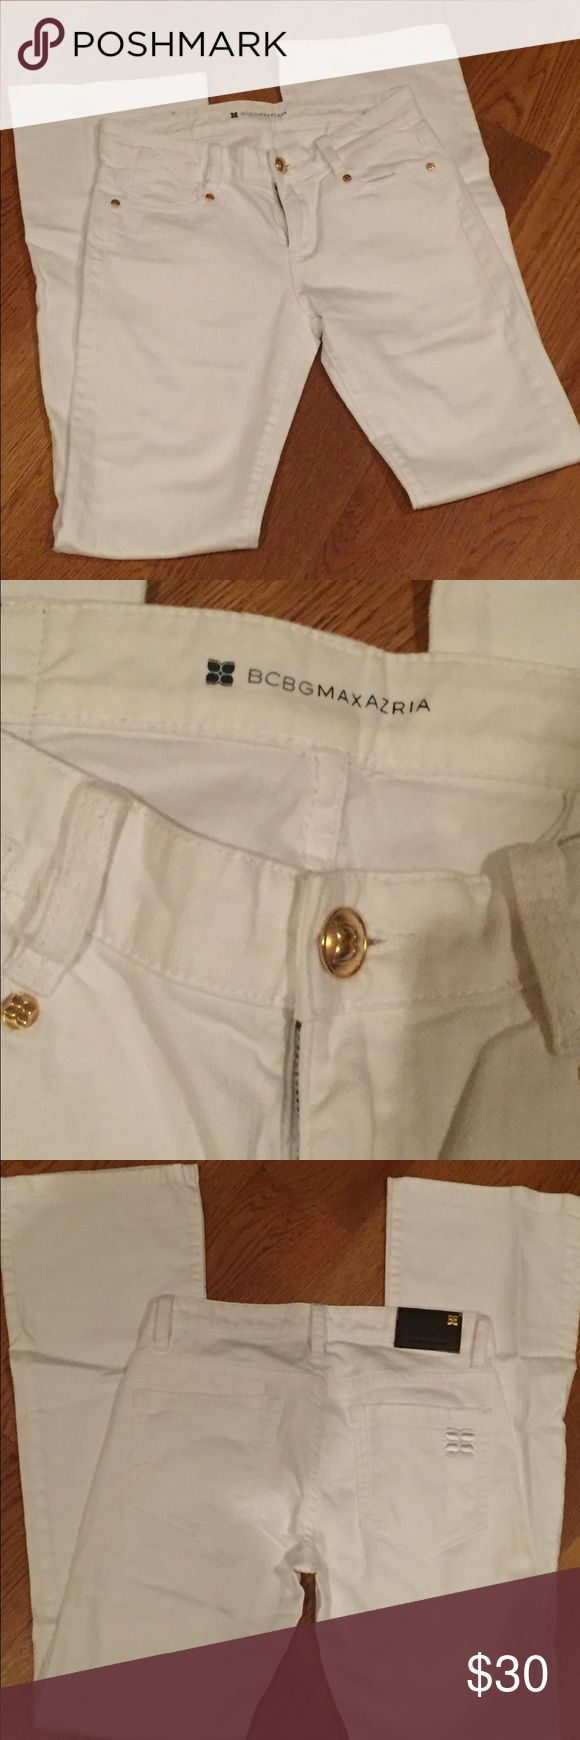 "BCBG White Bootcut Jeans Hardly worn, white denim in Bootcut style. Gold hardware. 8.5"" rise, 31"" inseam, 26"" waist. 99% cotton, 1% spandex. BCBGMaxAzria Jeans Boot Cut"